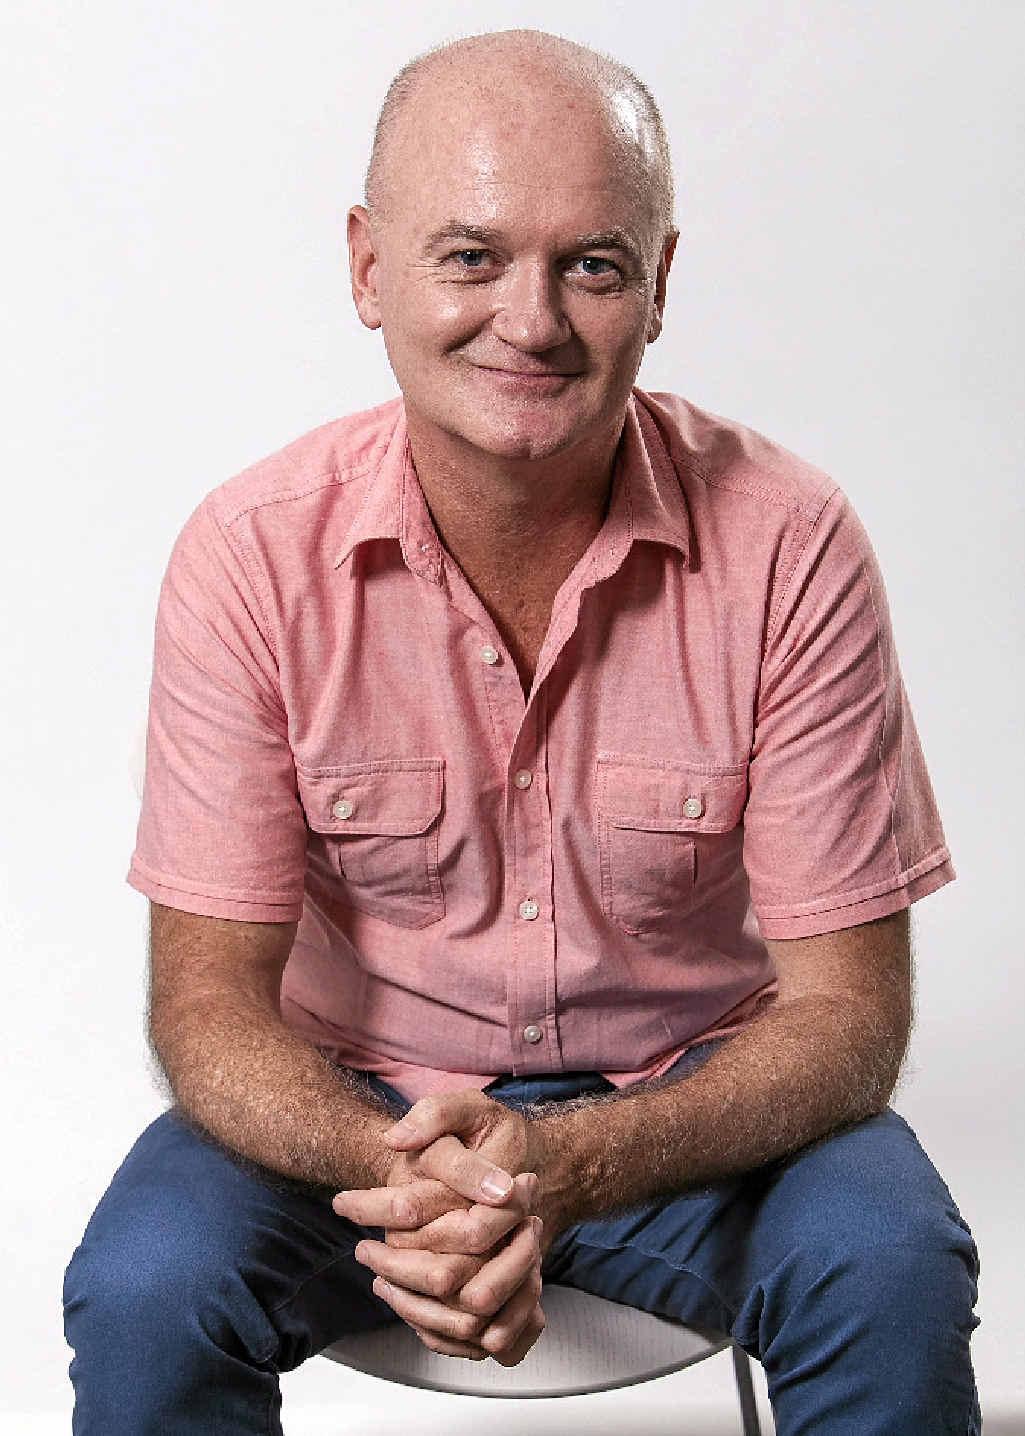 David Dyer is a Sydney-based teacher and author.